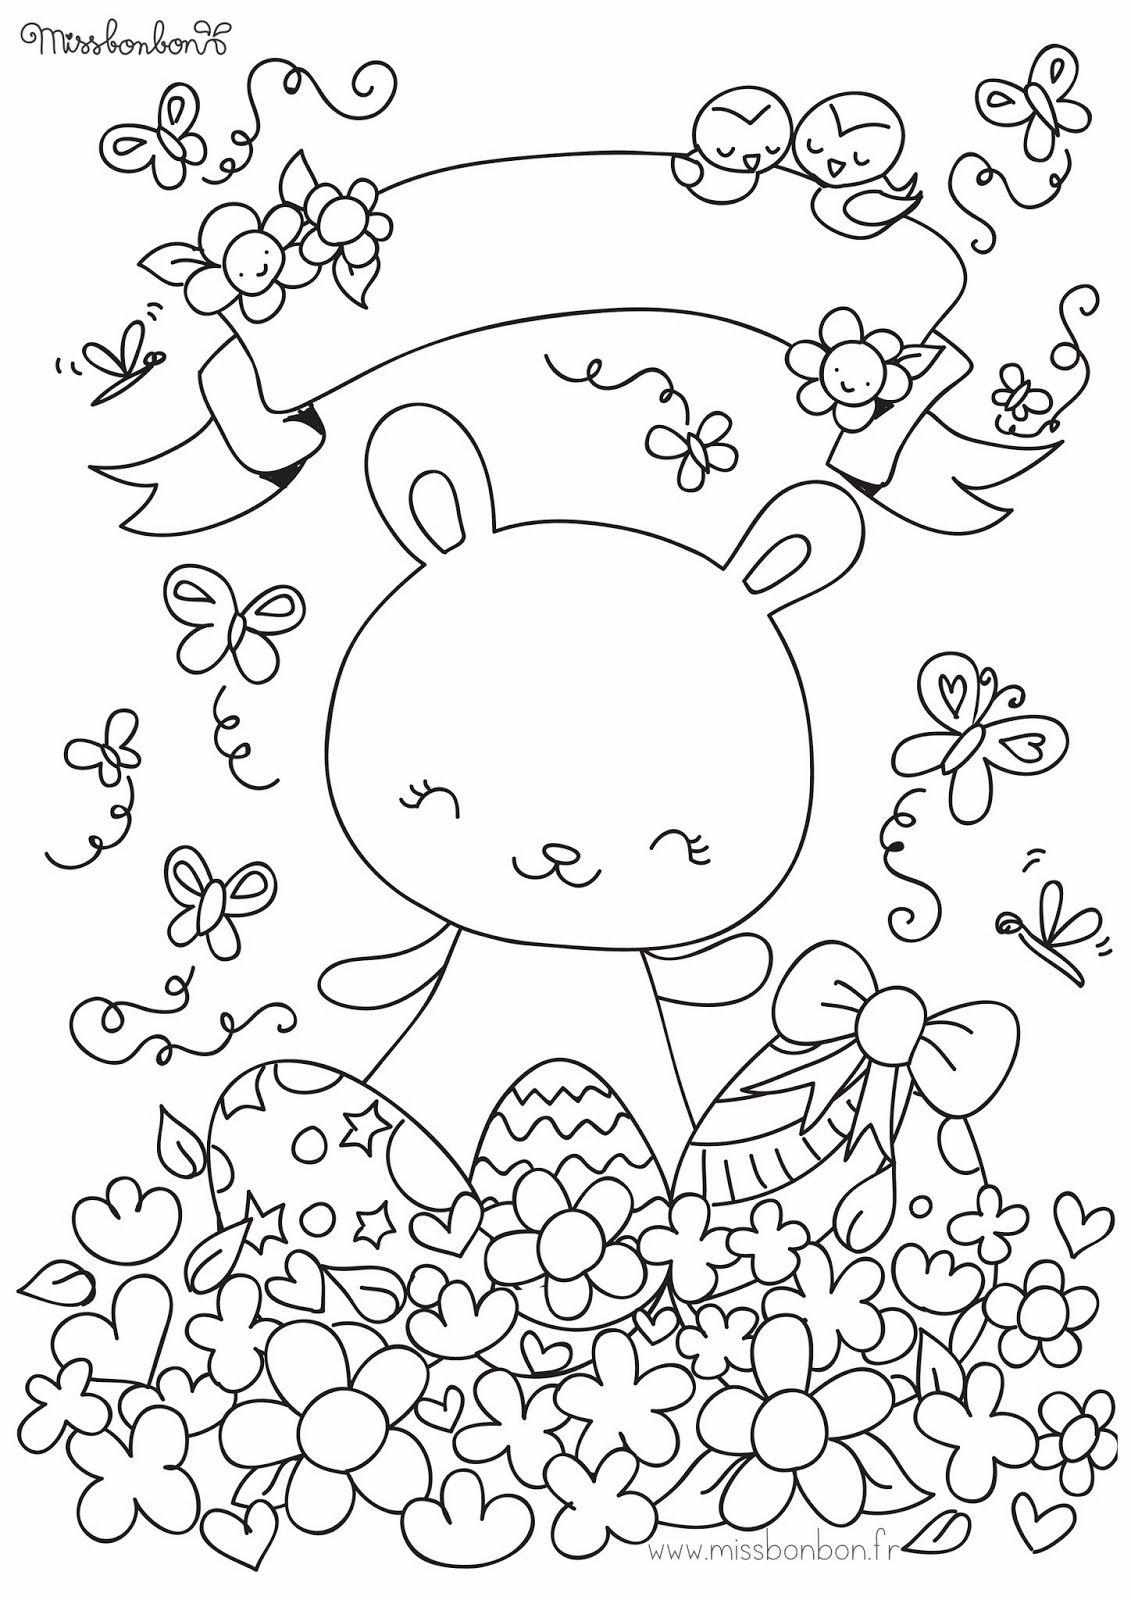 Coloriage de Pâques - Miss Bonbon   dibujos para pintar cata ...